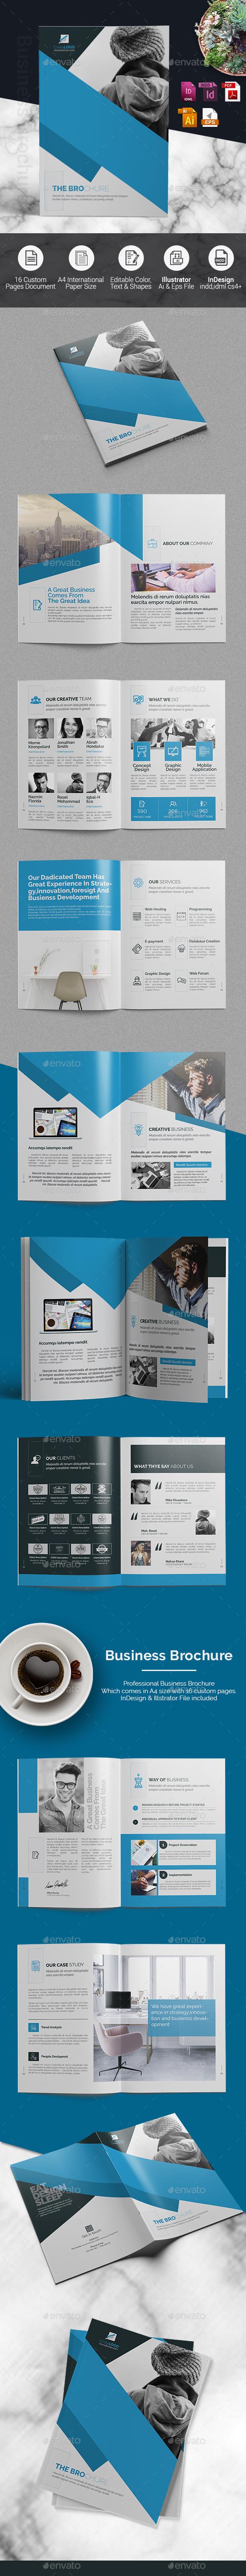 Corporate Brochure -InDesign Template - Corporate Brochures